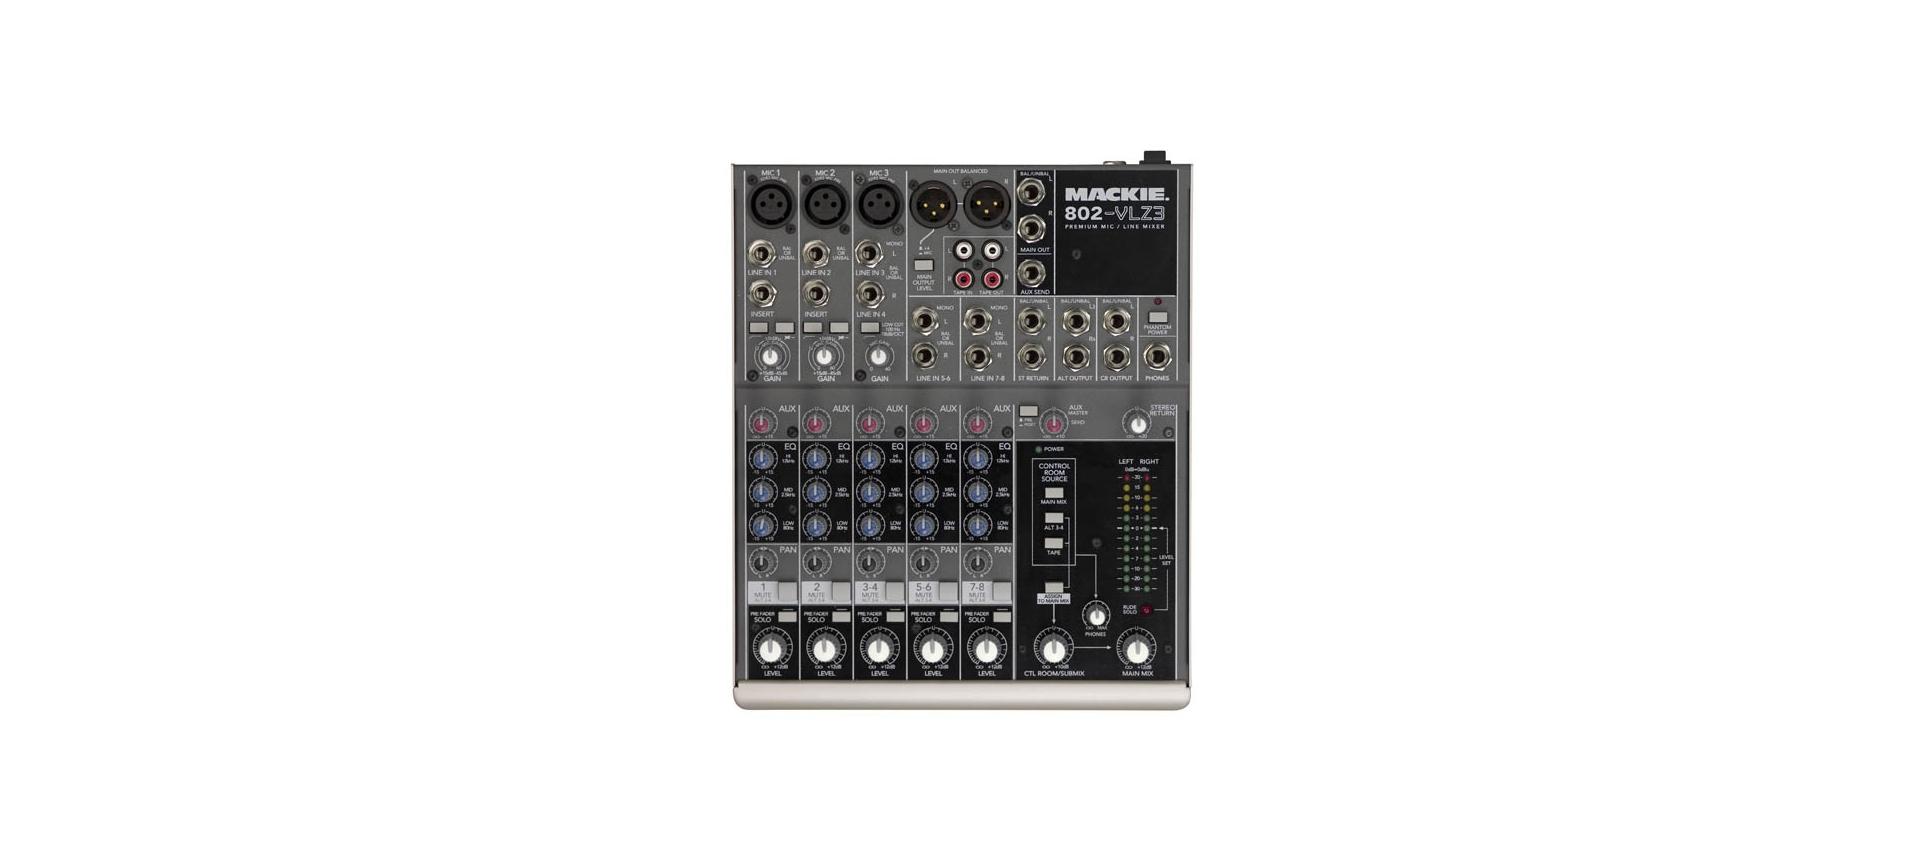 Mackie 802vlz3 Mixer 8 Canali Analogici